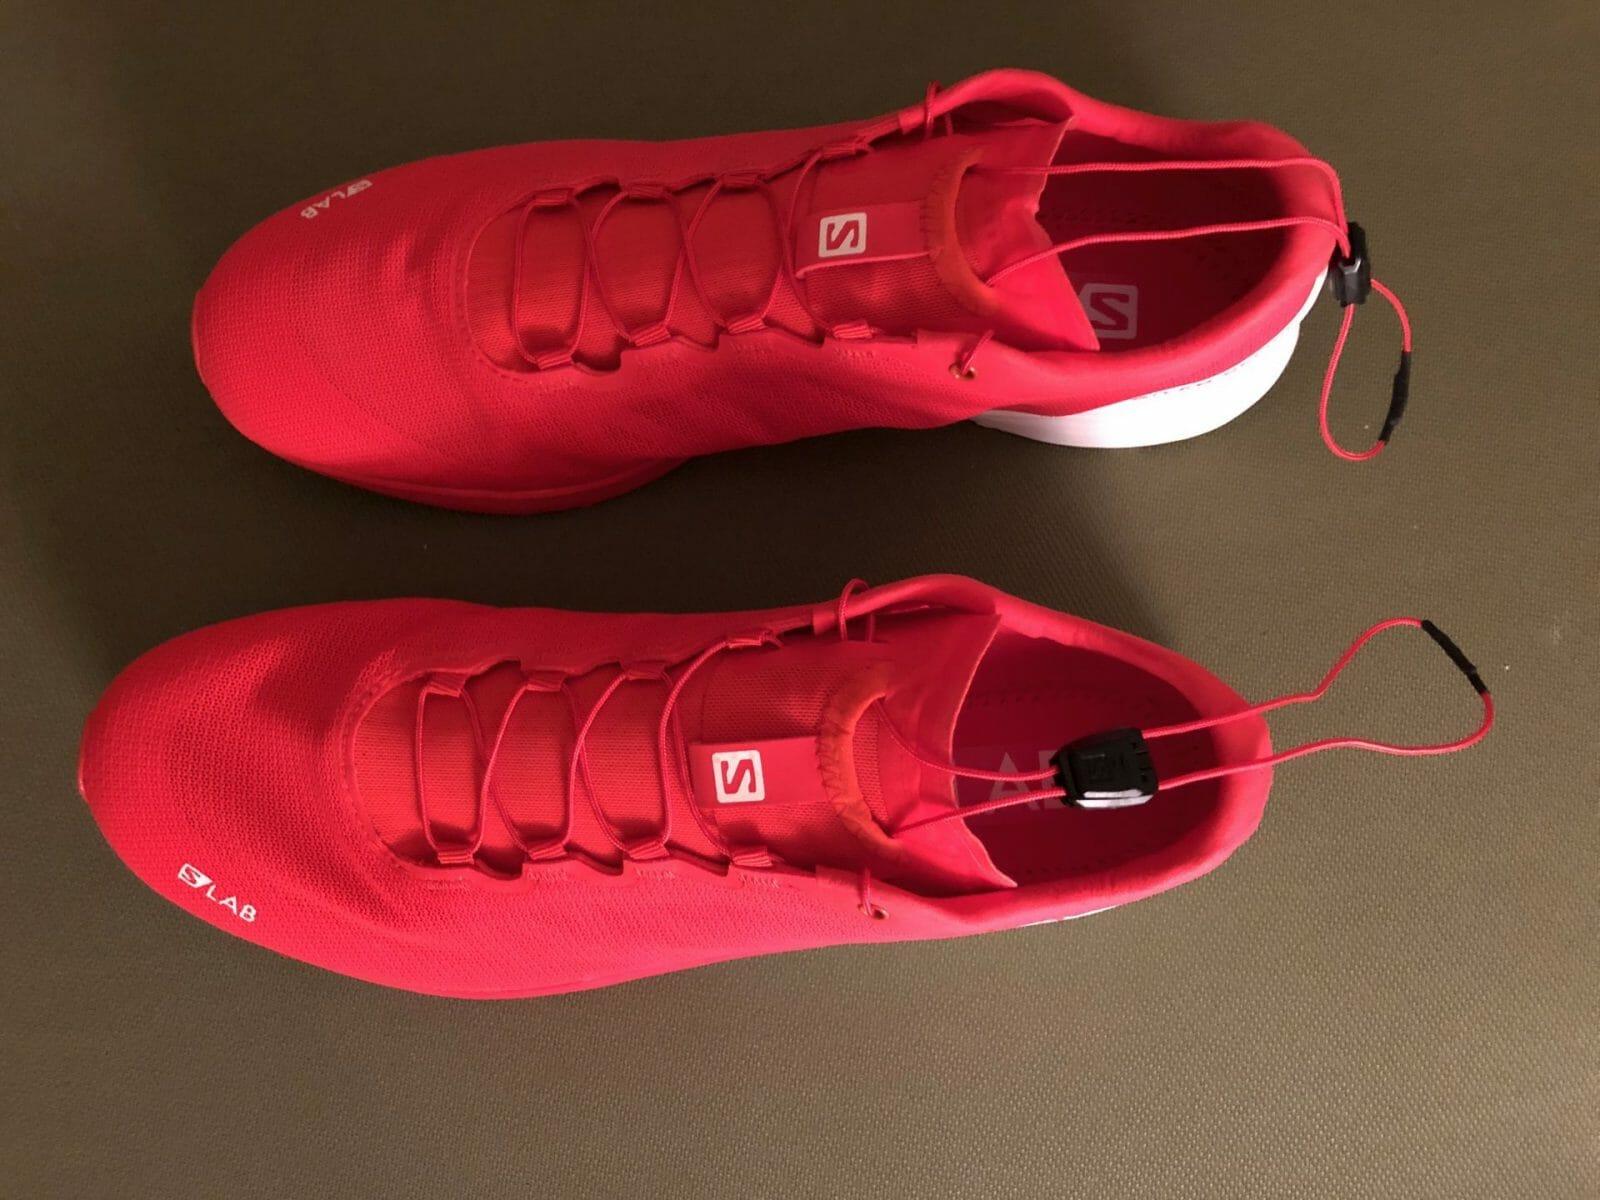 Salomon S-Lab Sense 7 Review | Running Shoes Guru